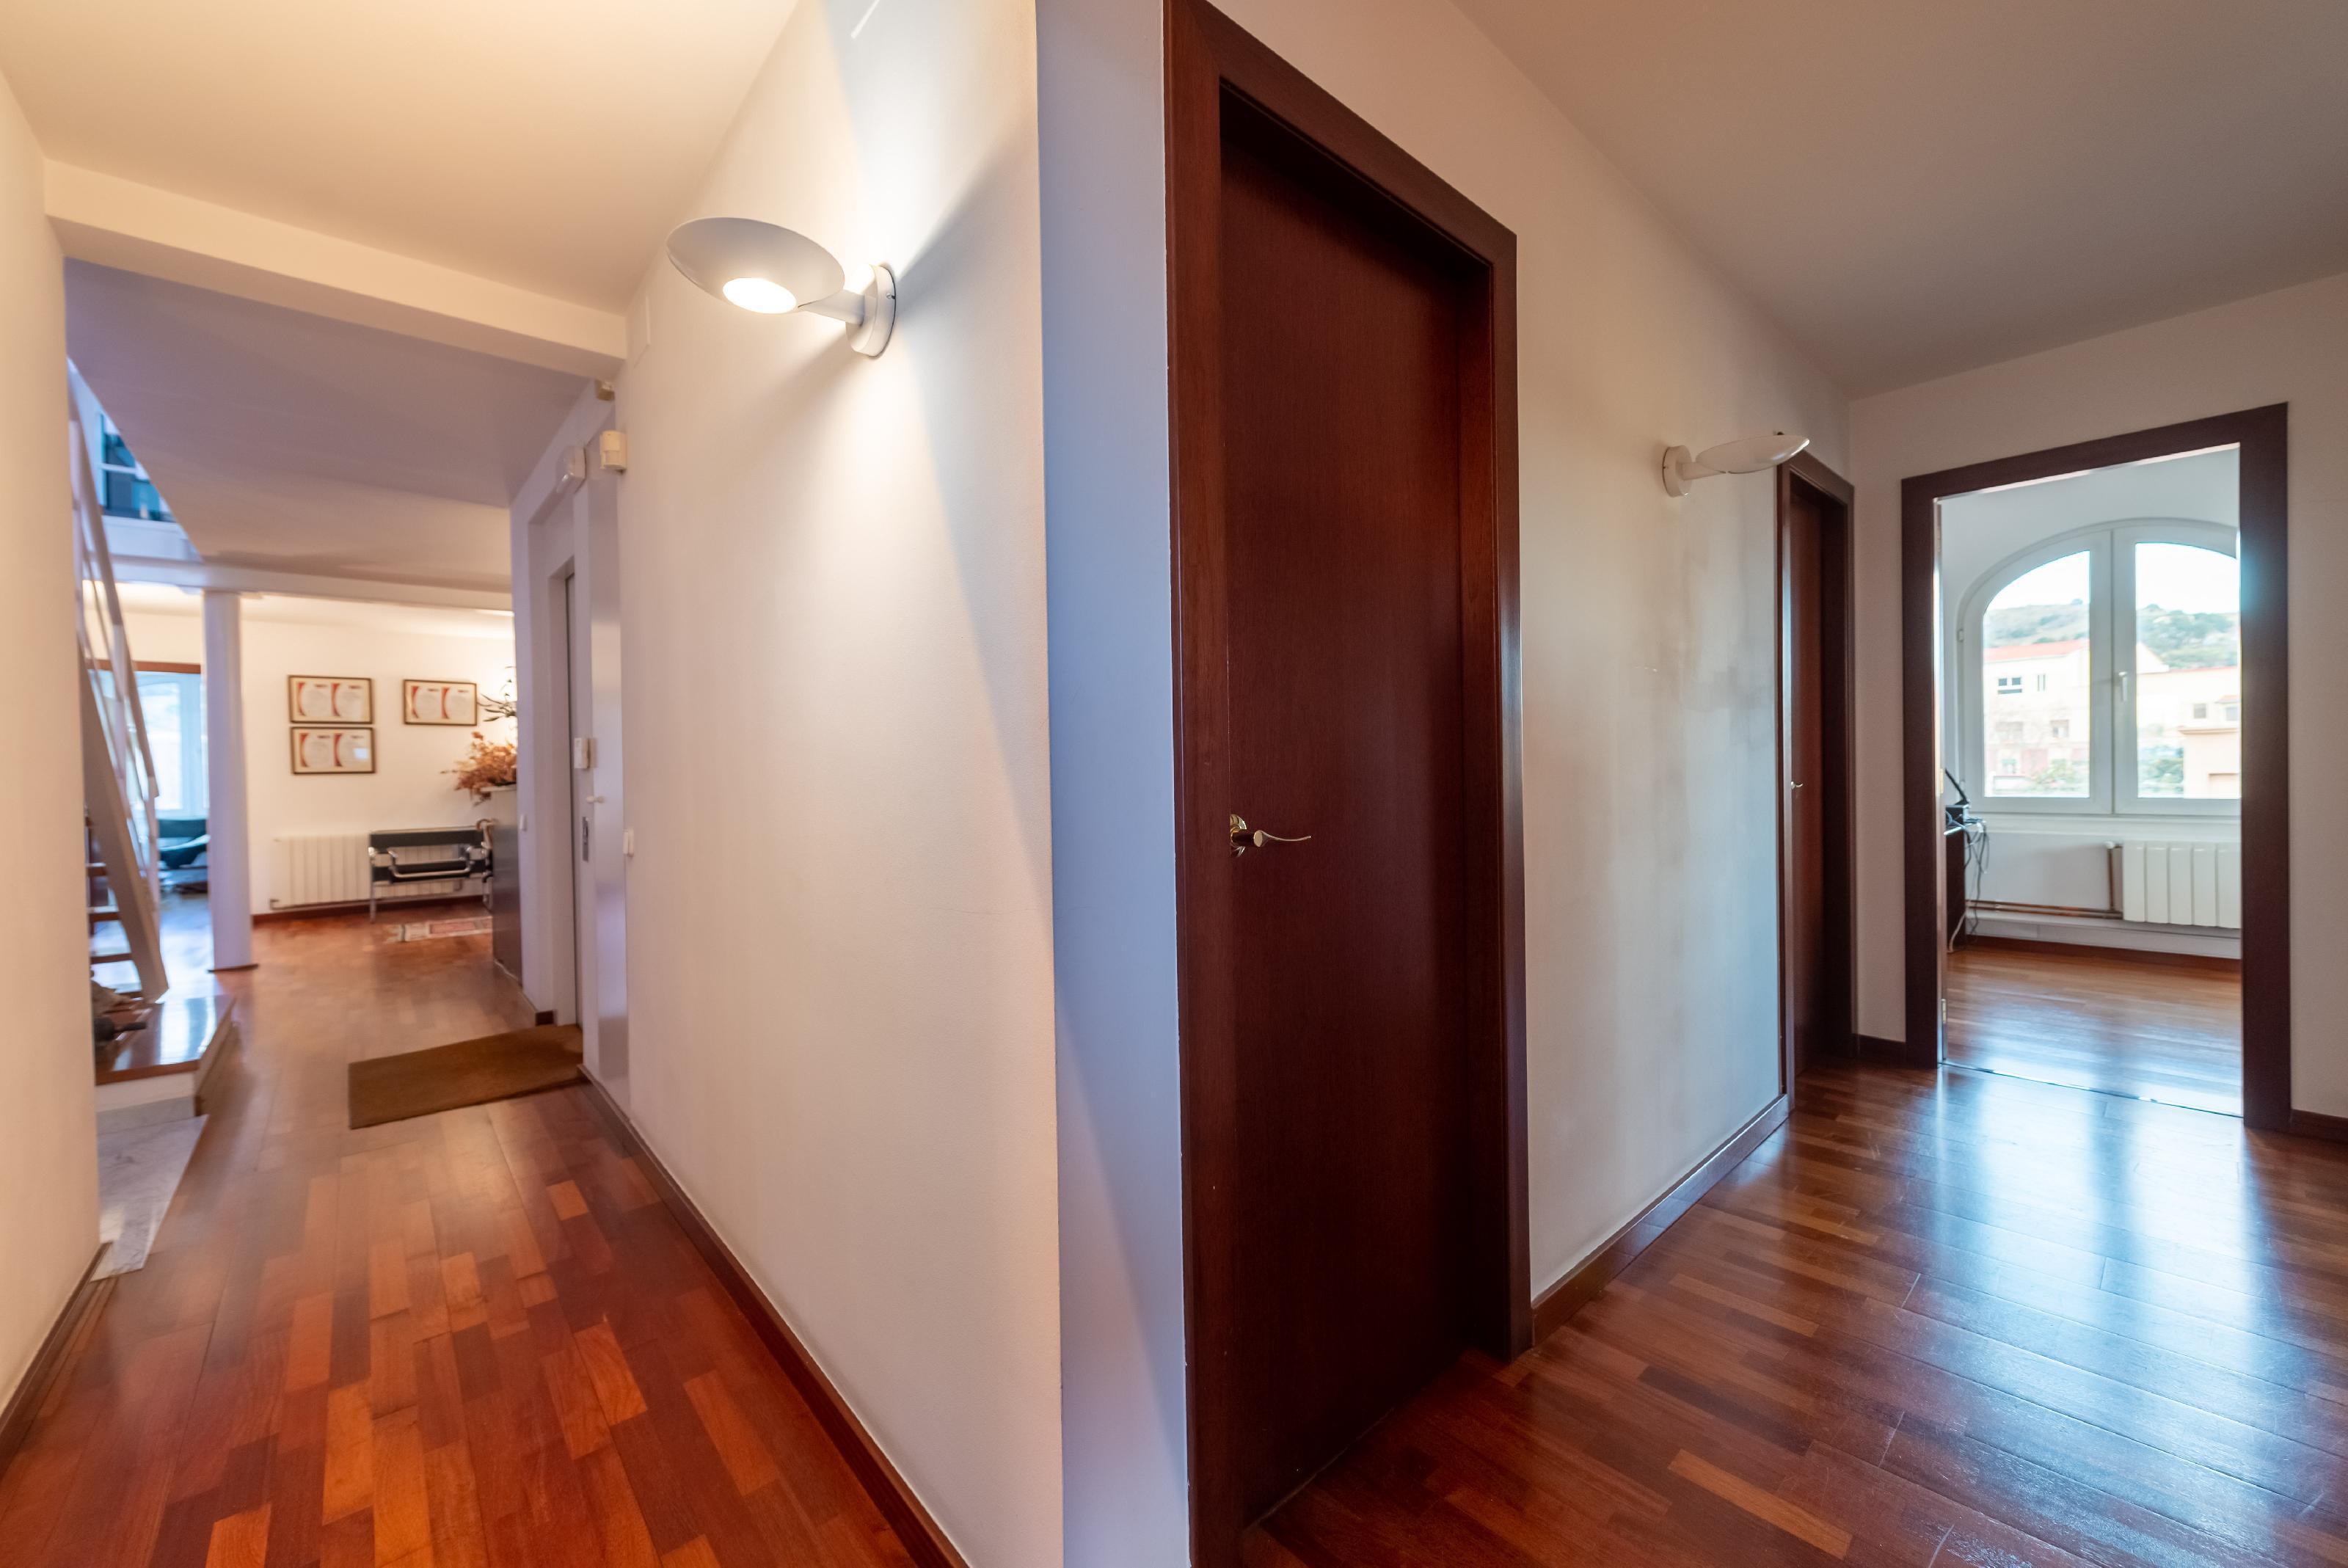 246066 Penthouse for sale in Sarrià-Sant Gervasi, Sarrià 11